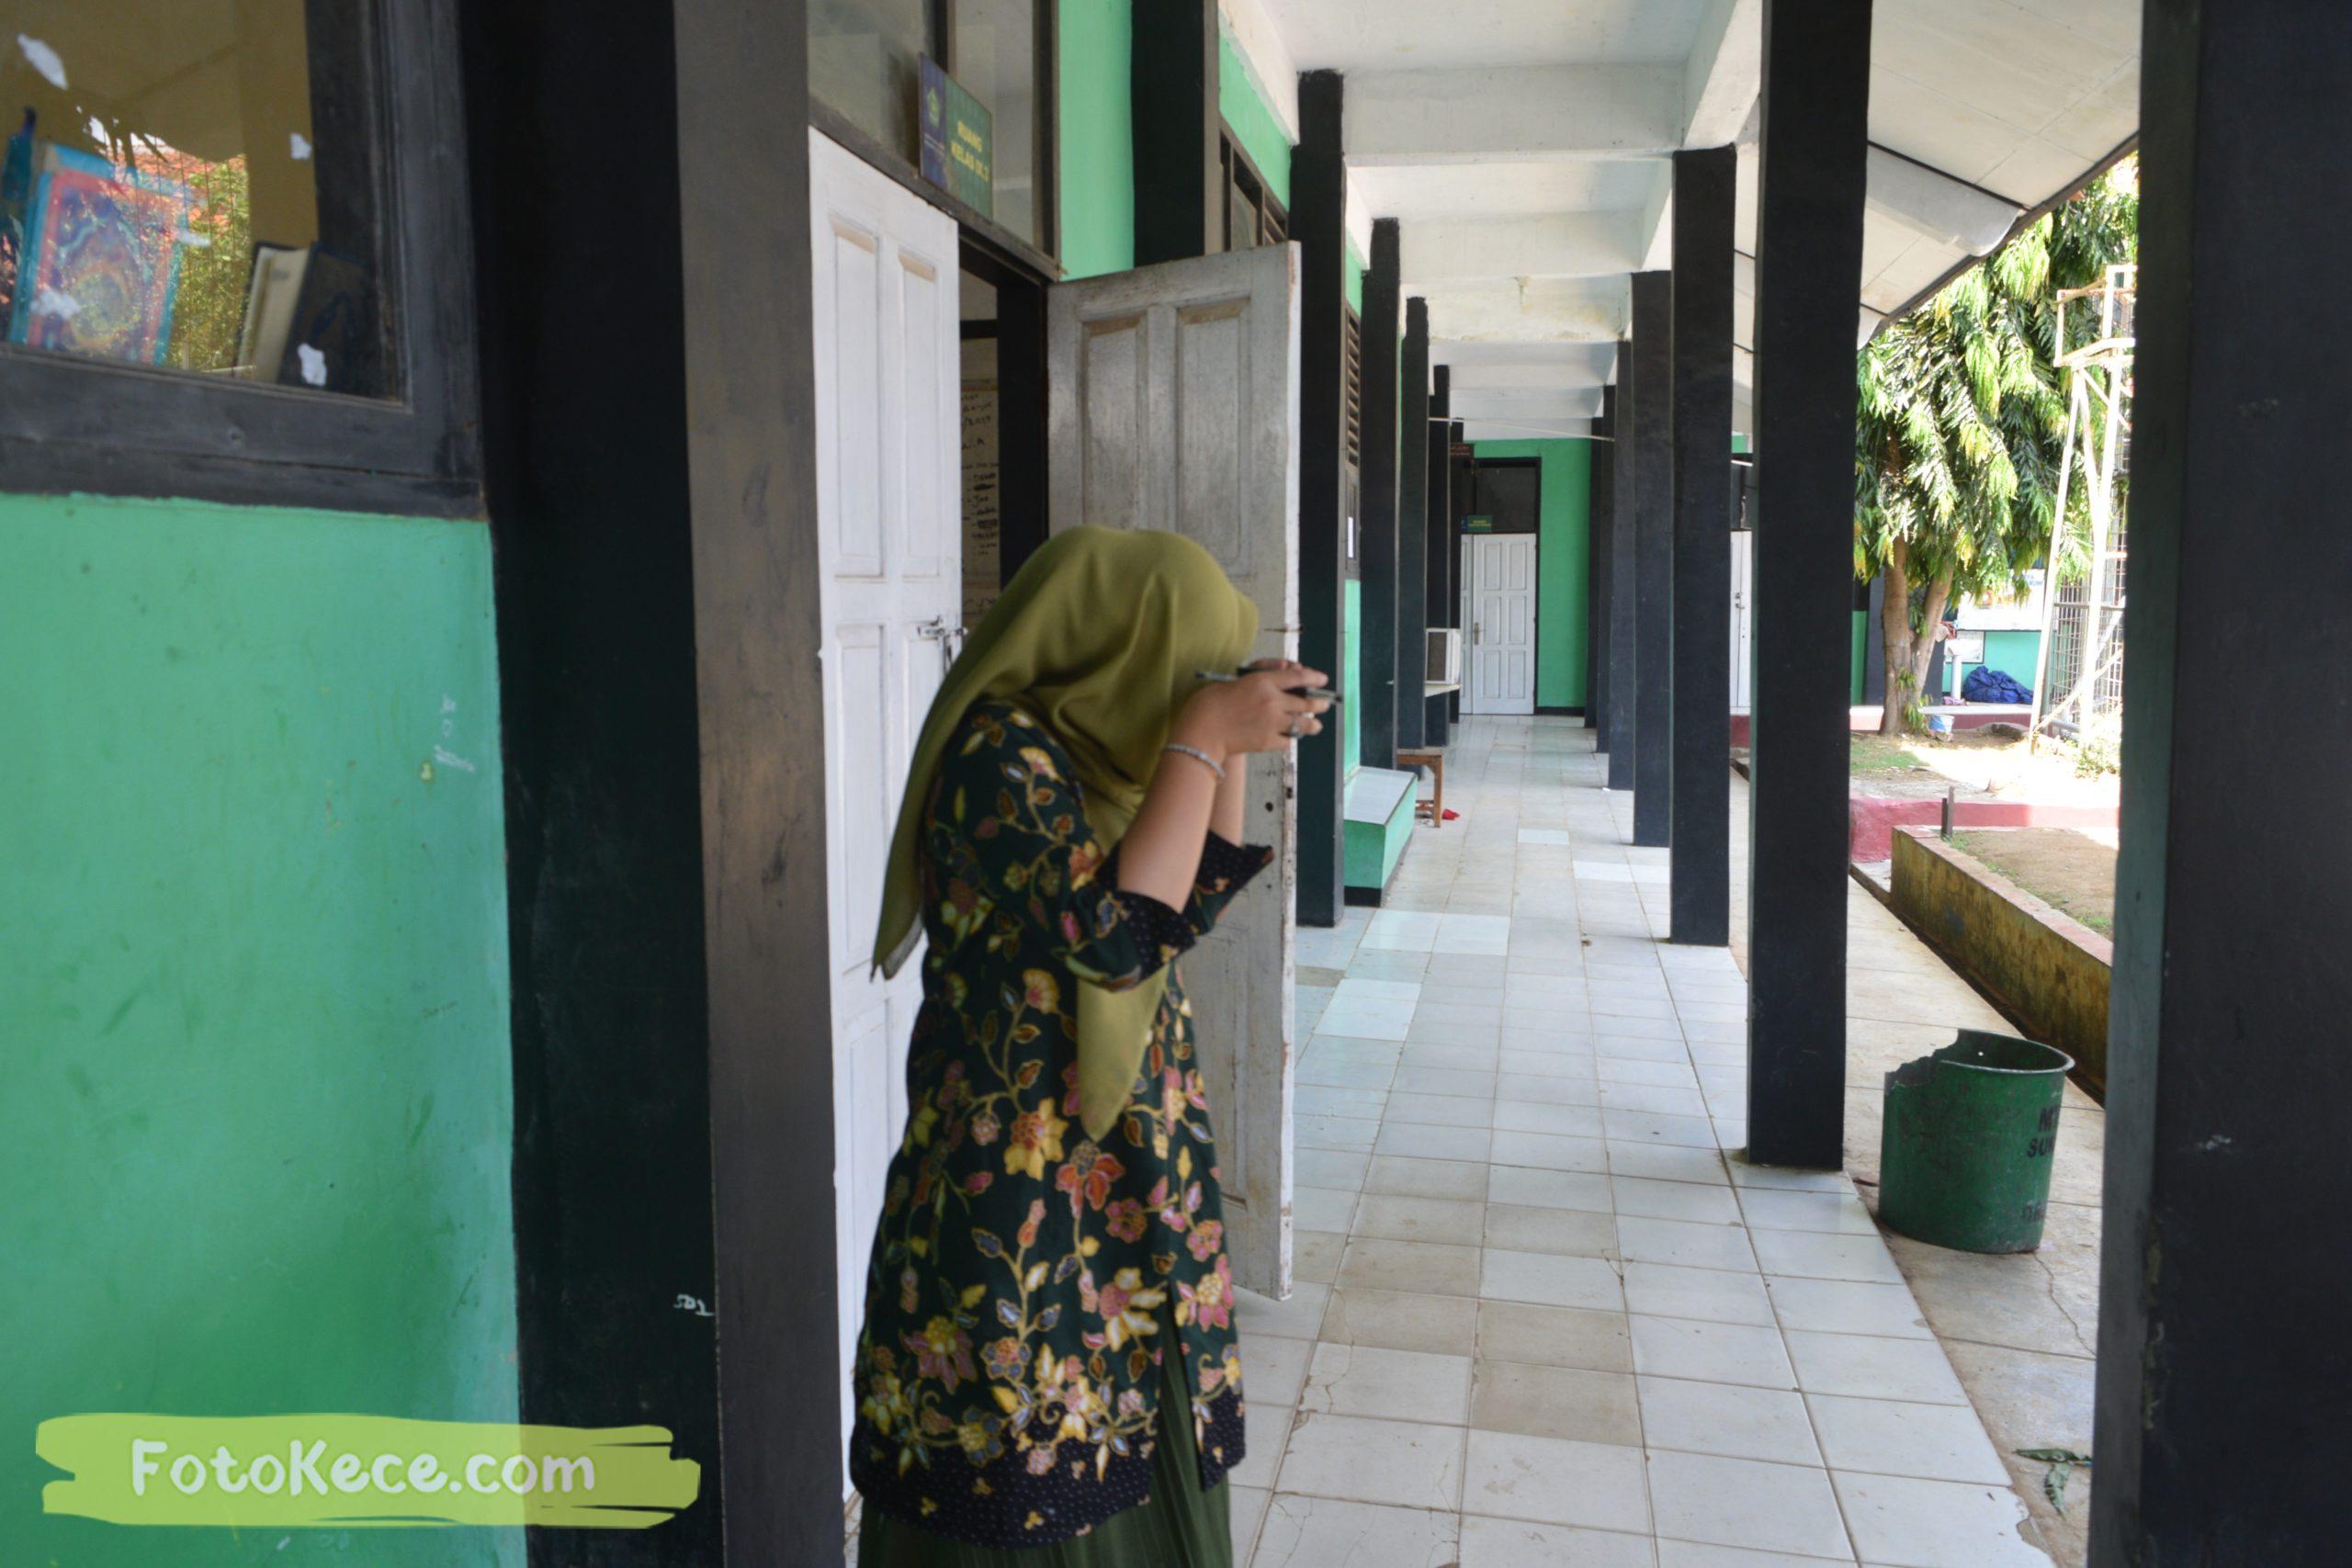 SUZANA DWI NURFAJRIEN santai pada mtsn2 smi fotokece des 2019 25 scaled